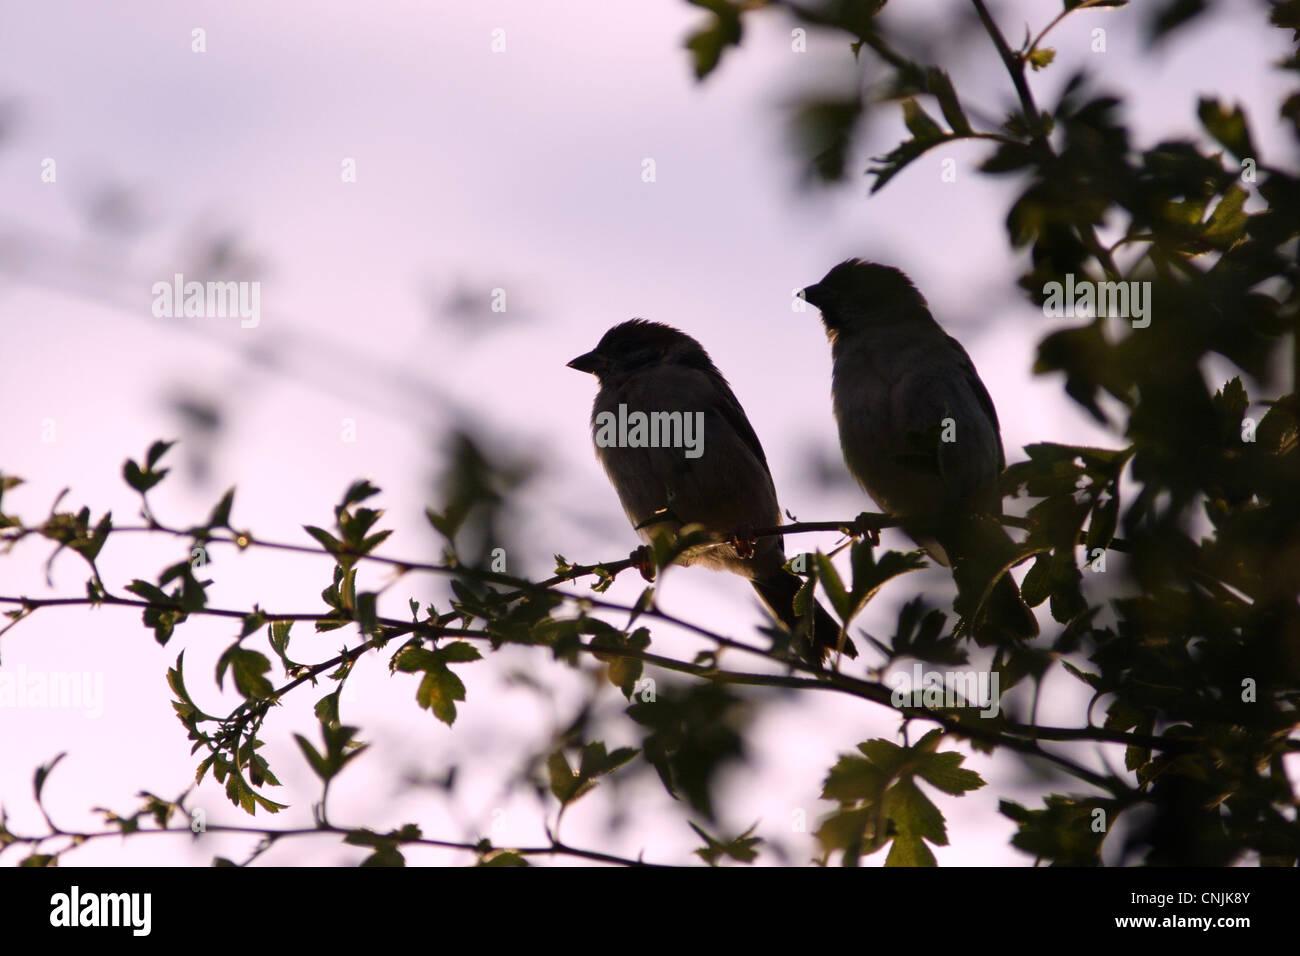 eurasian-tree-sparrow-passer-montanus-ad